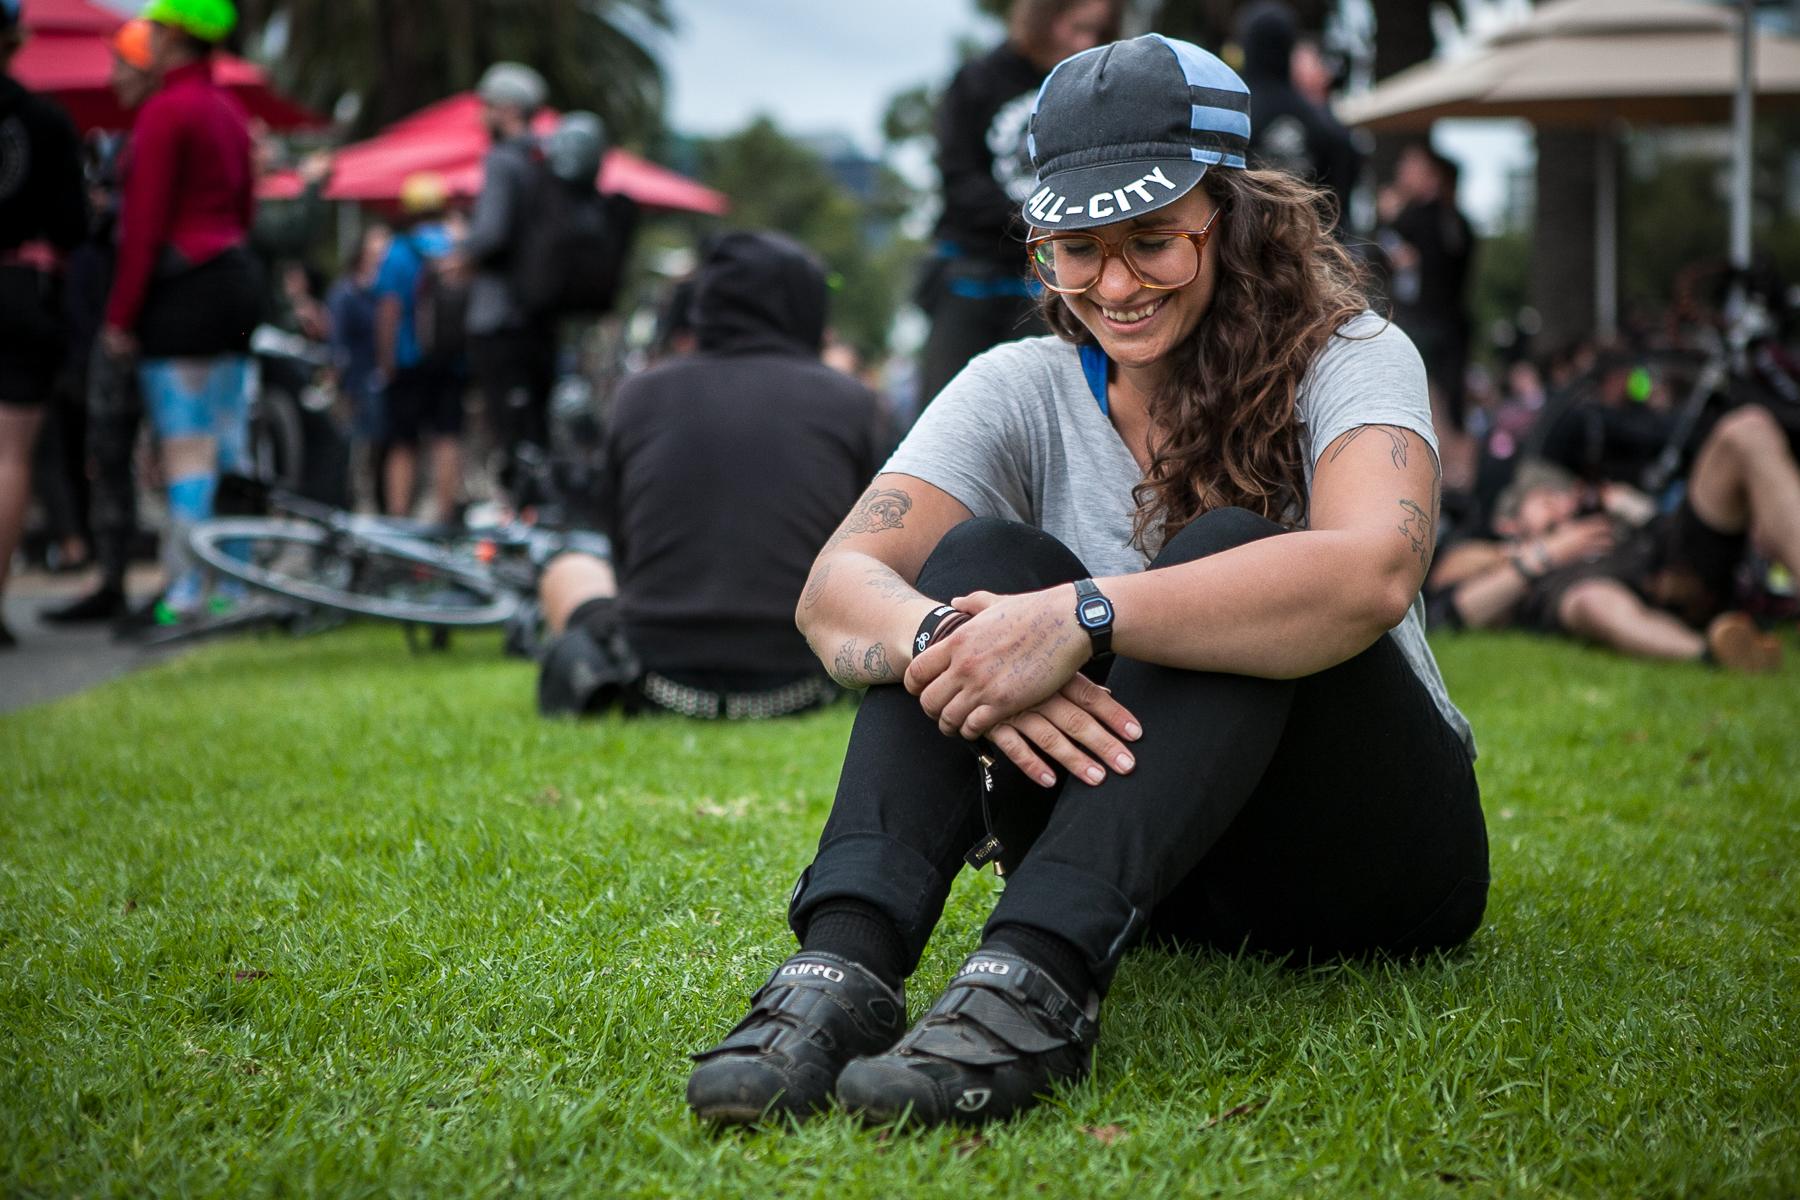 Nikki Munvez, Photo by Chris Lee